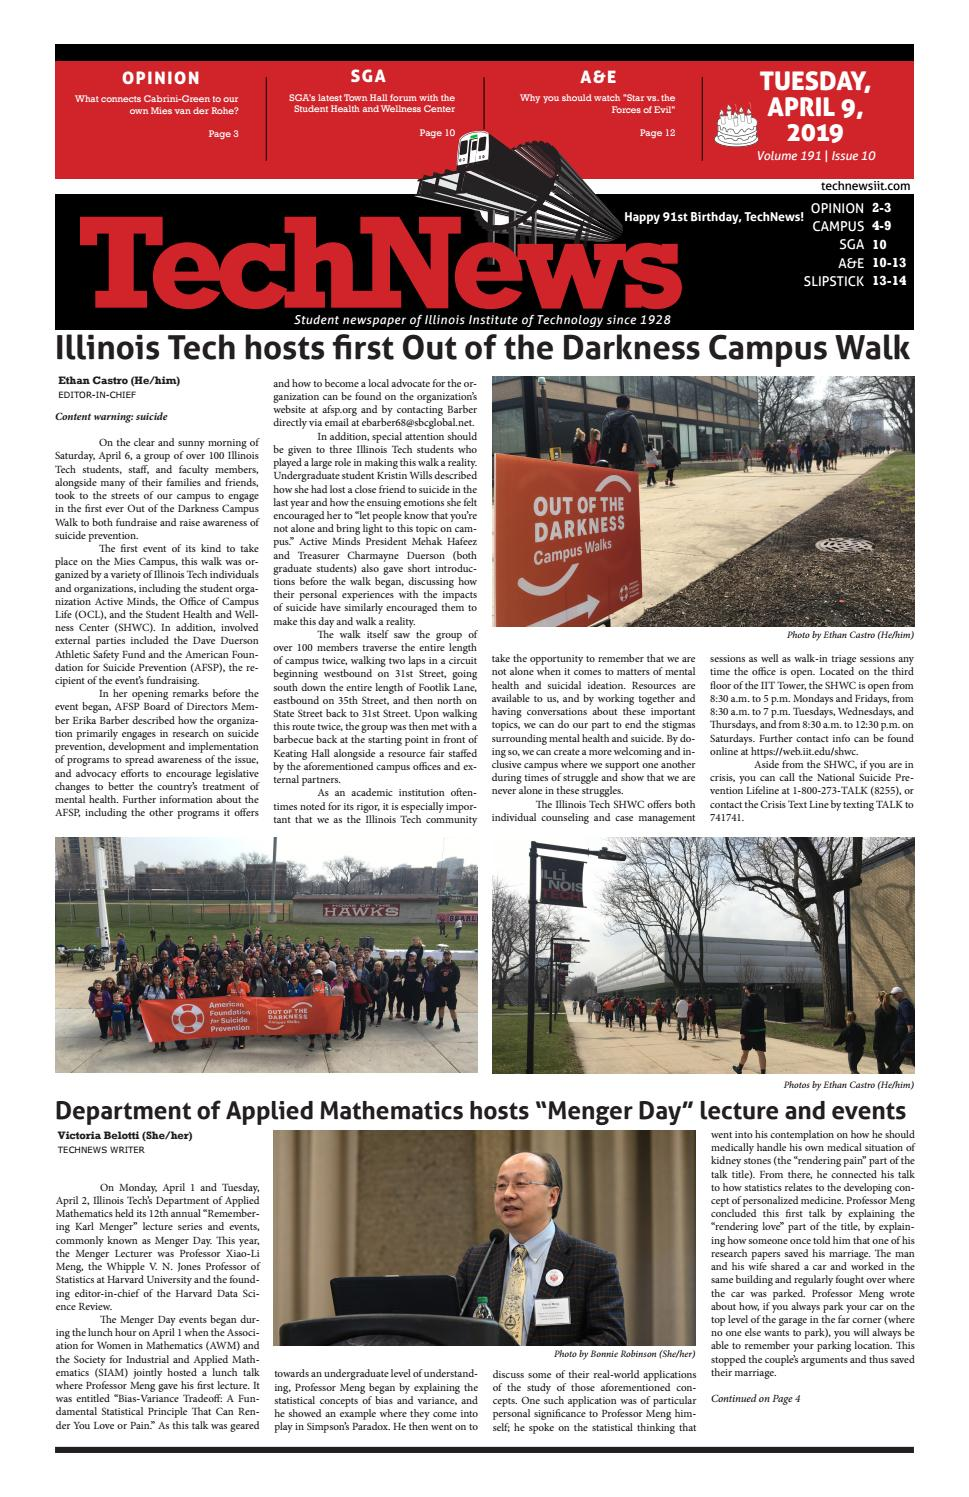 Volume 191 Issue 10 by TechNews - issuu